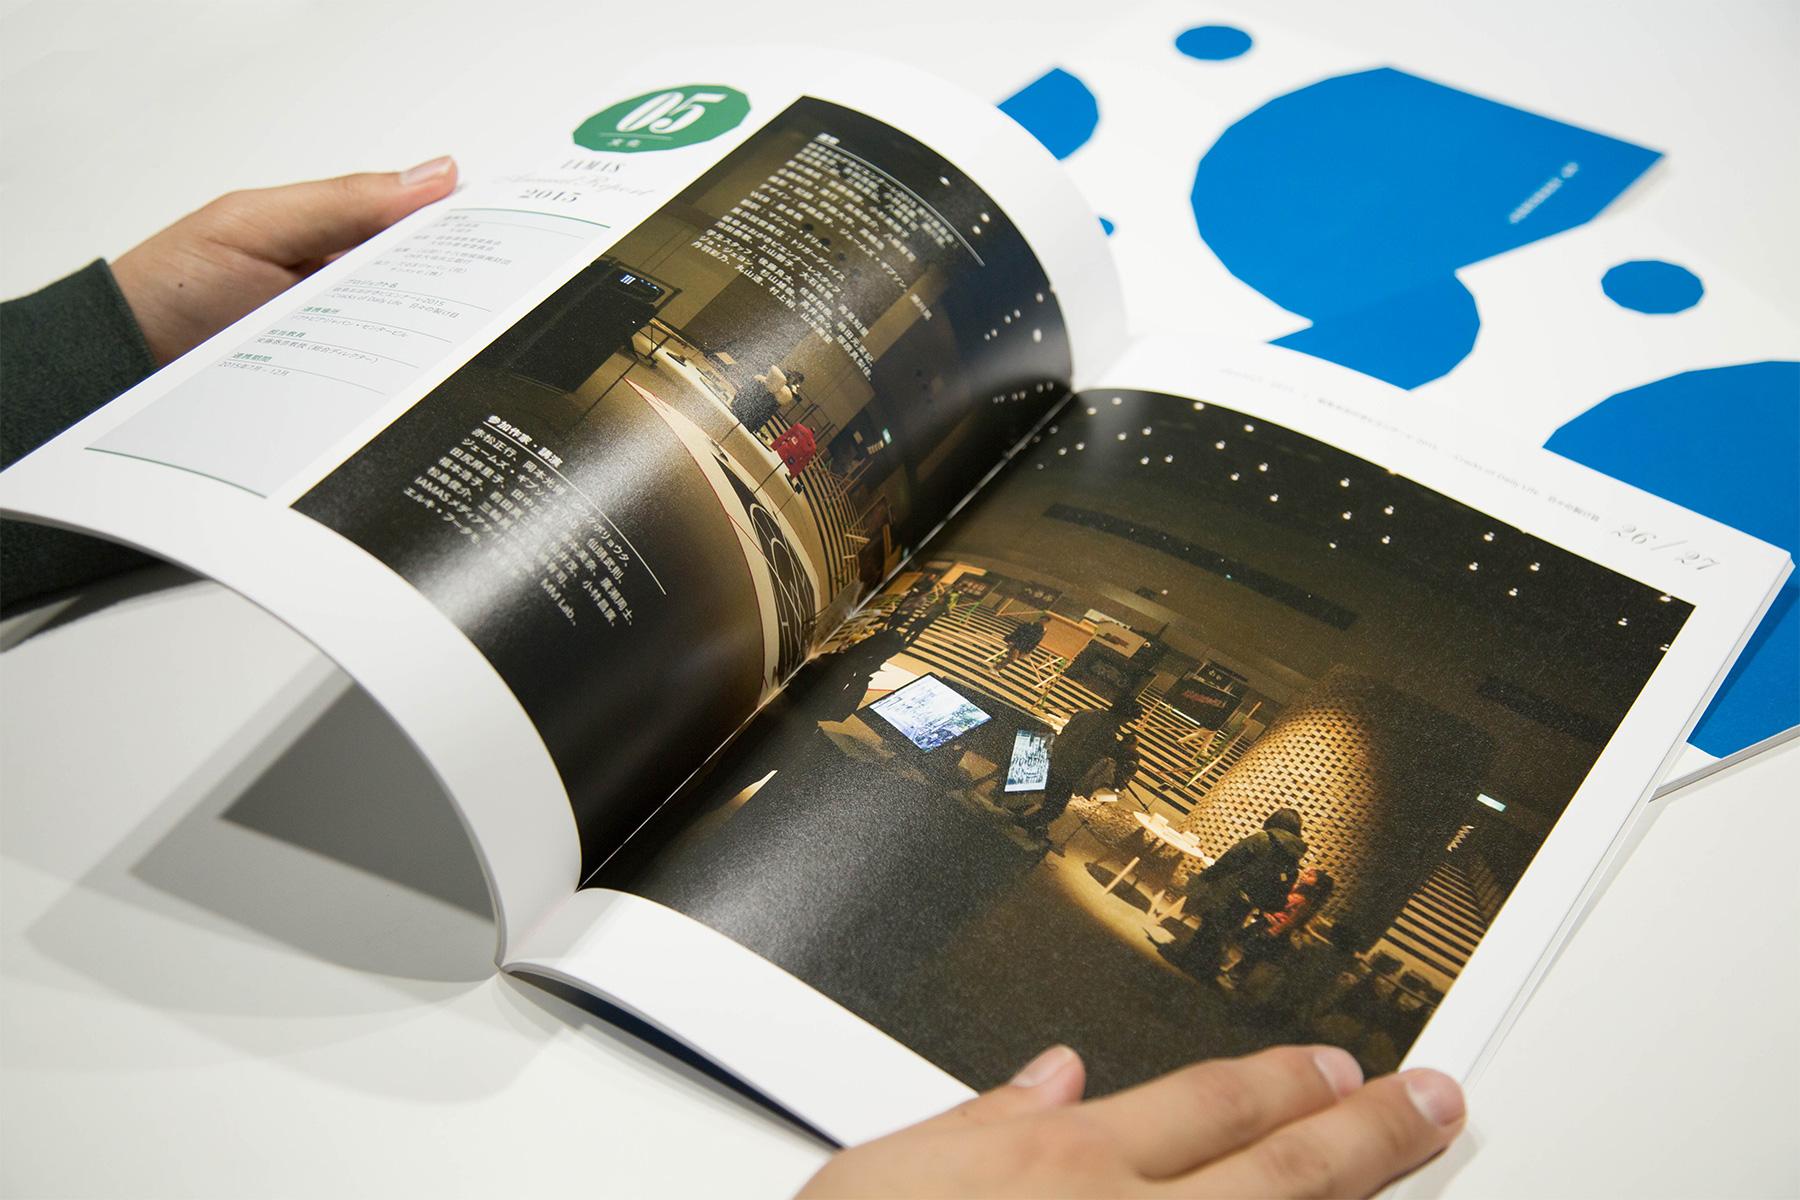 IAMAS Annual Report 2015 産業・地域連携成果報告イメージ